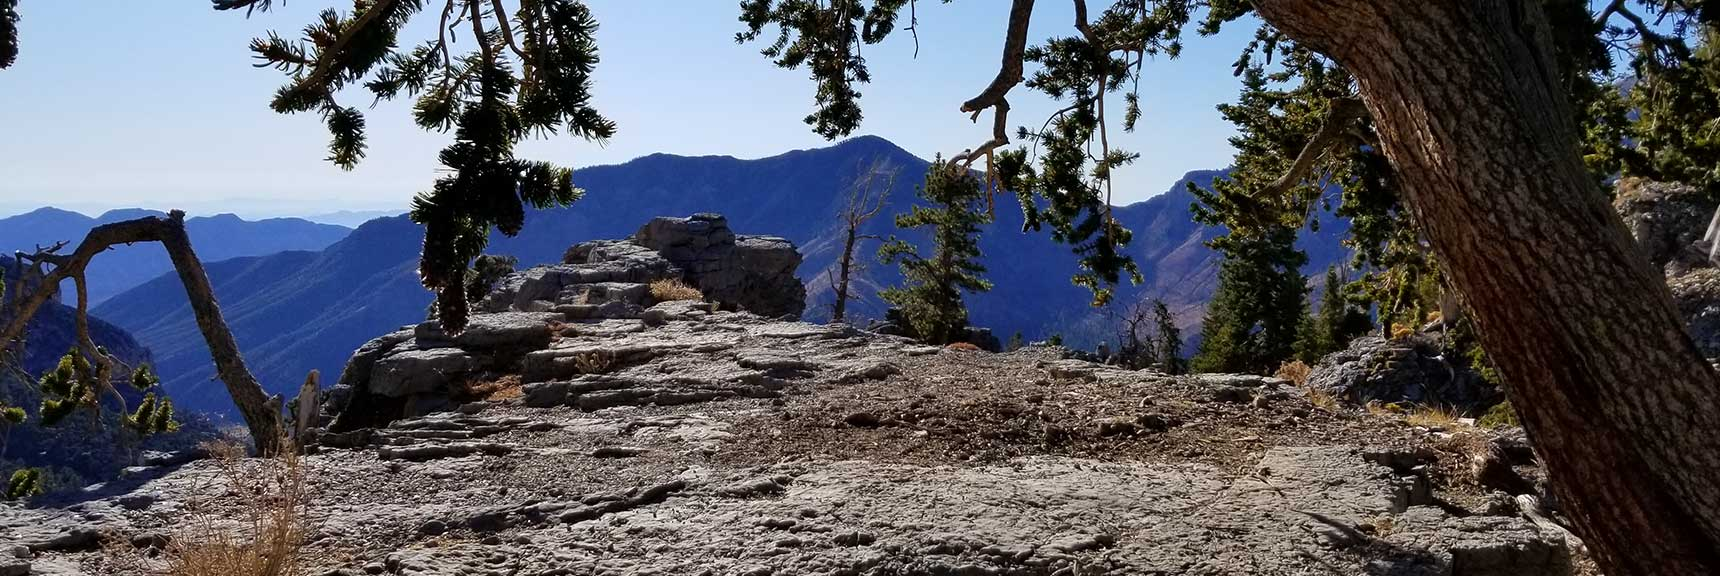 Cockscomb Ridge Wilderness Circuit in Mt. Charleston Wilderness, Nevada